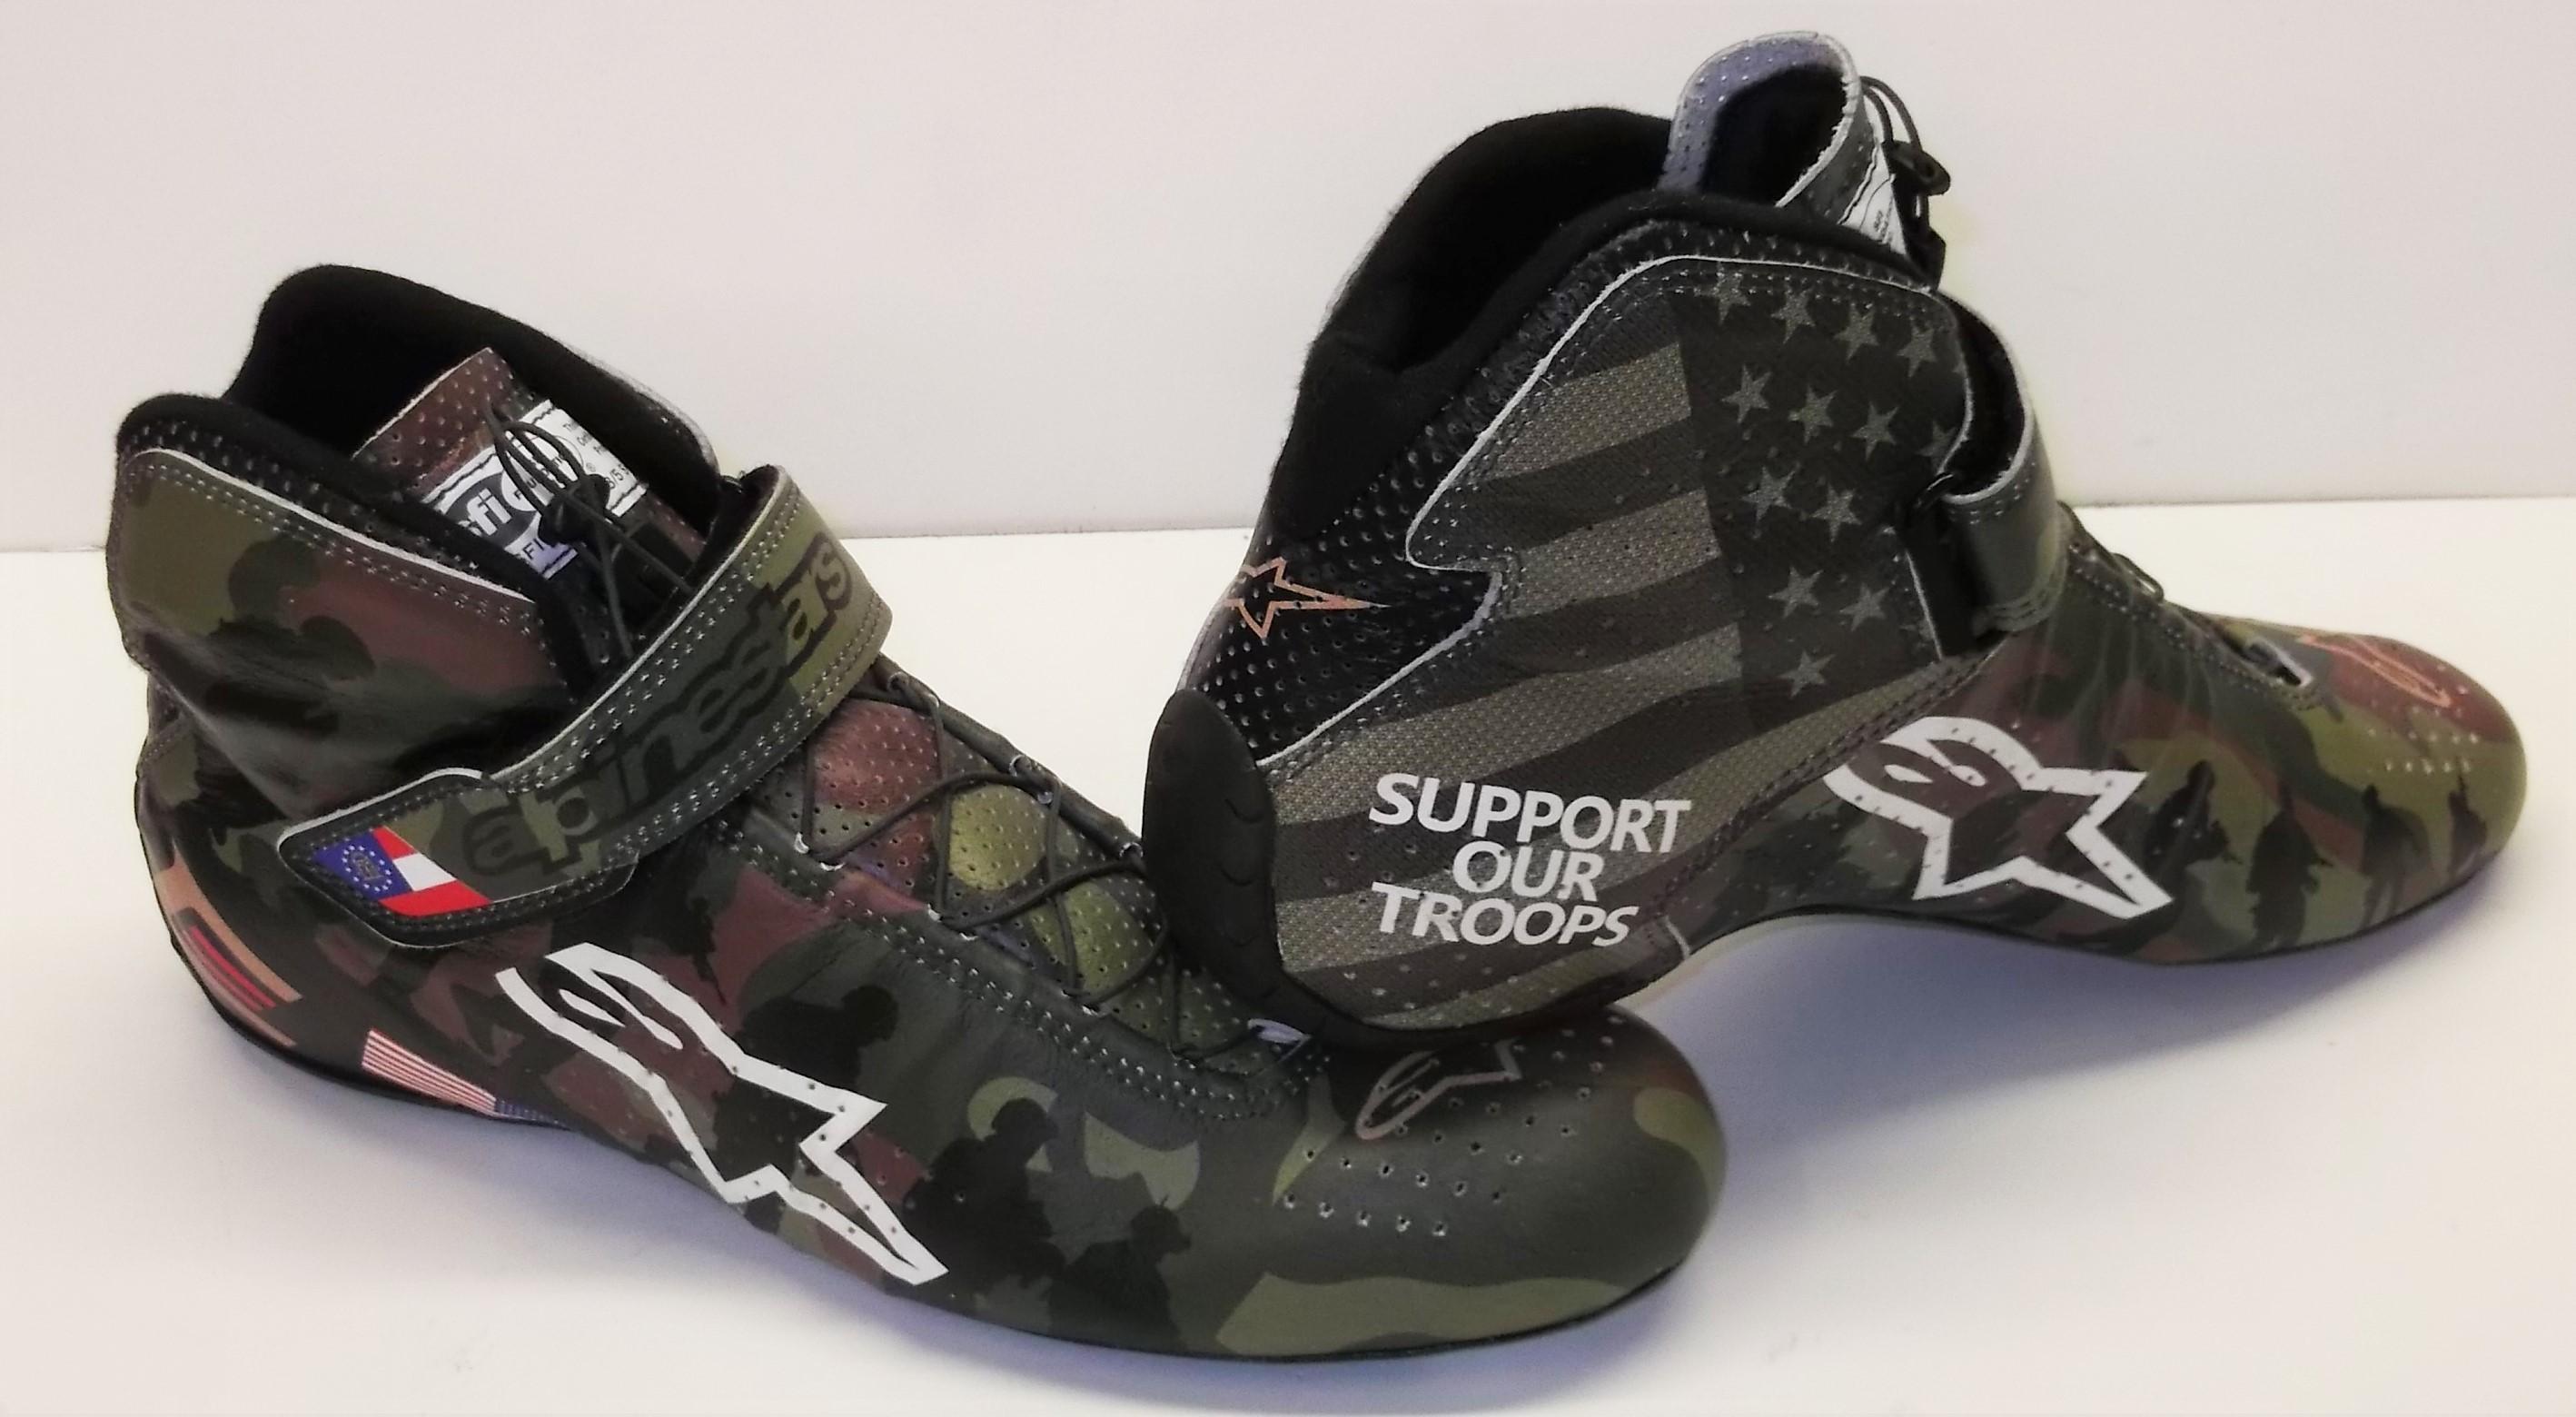 5aee1724c4b1 Elliott to wear special shoes at Daytona